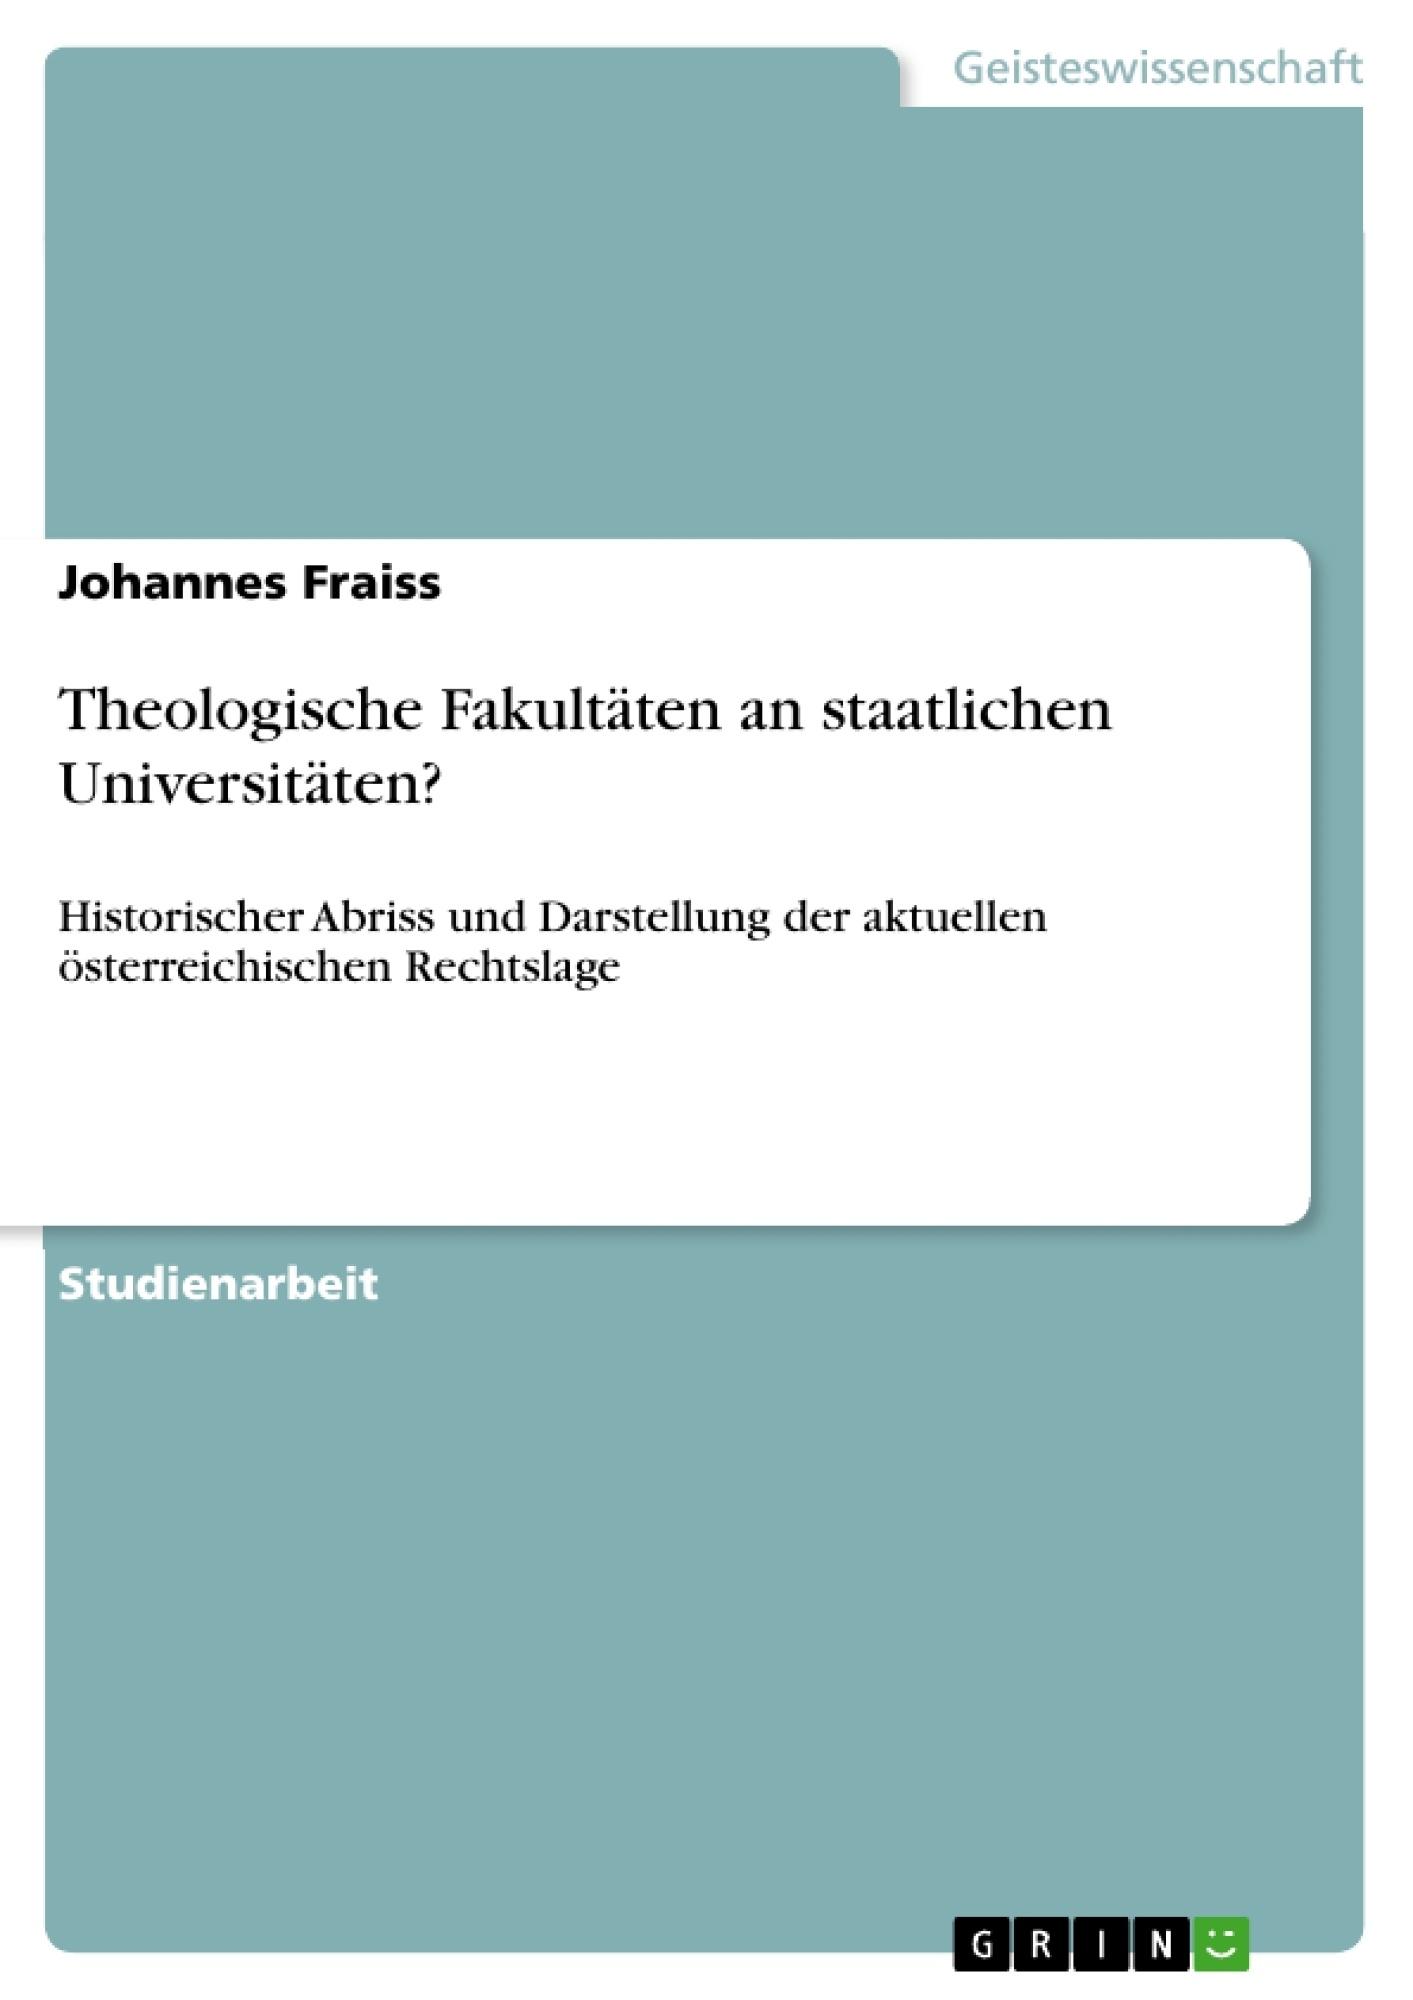 Titel: Theologische Fakultäten an staatlichen Universitäten?